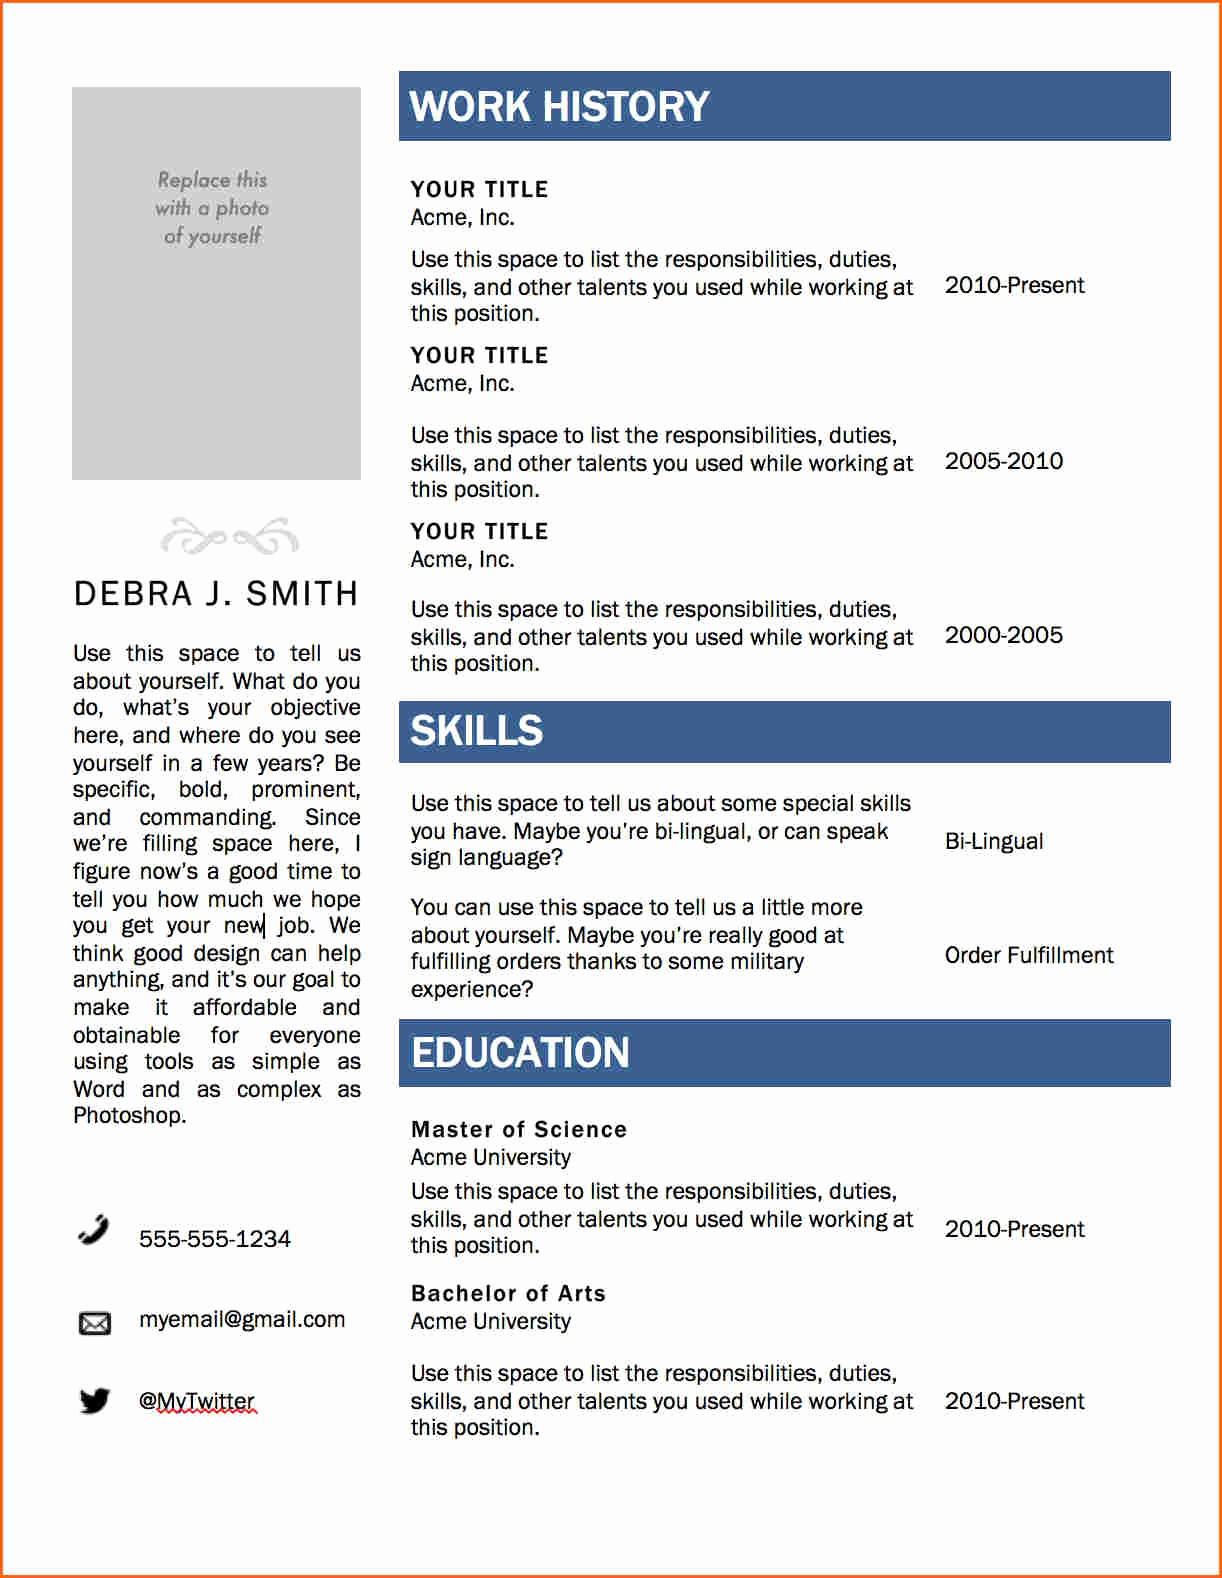 Resume Template Ms Word 2007 Elegant 6 Free Resume Templates Microsoft Word 2007 Bud